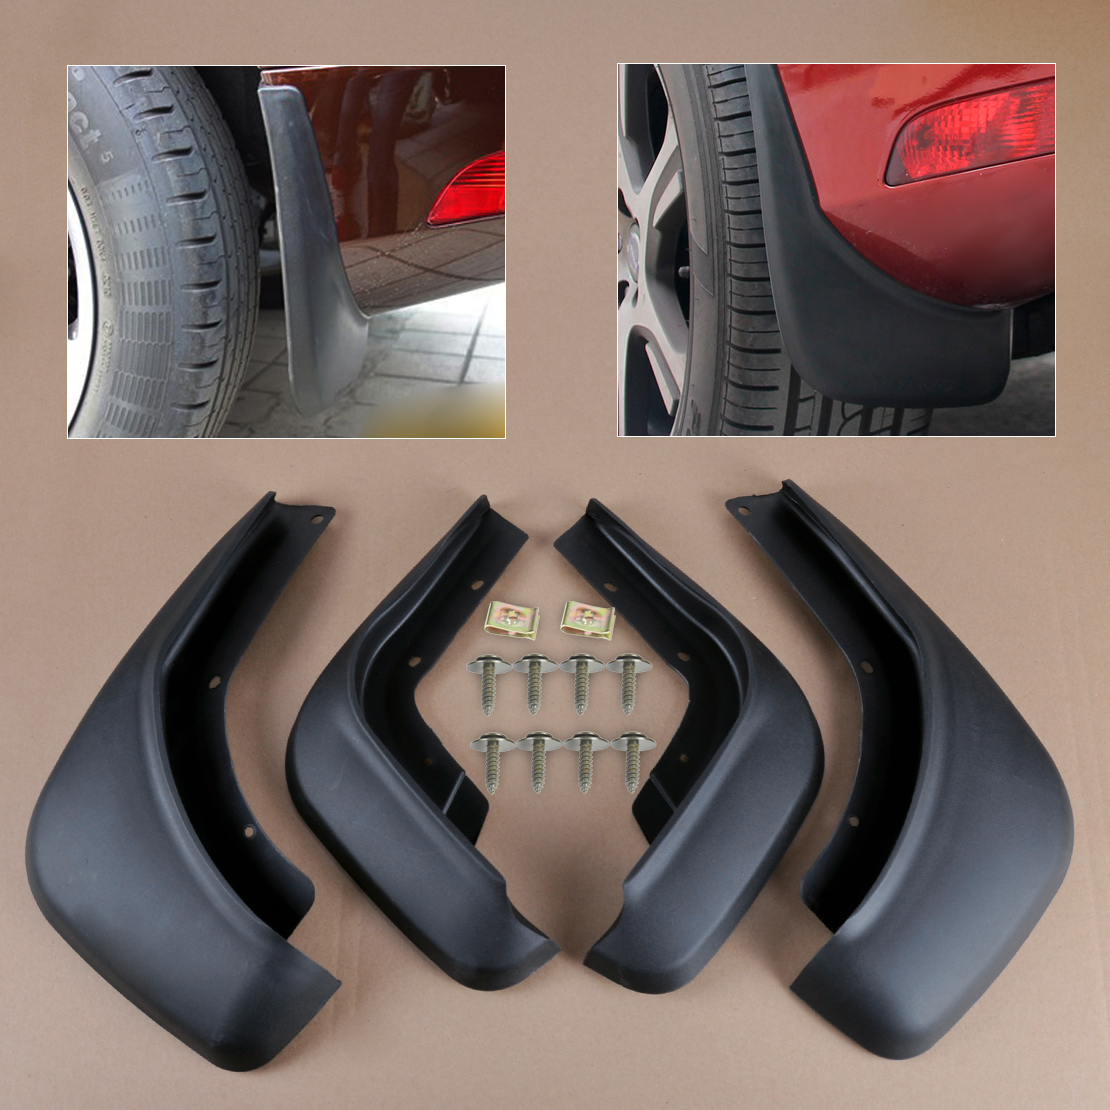 Sportflaps Mudflaps Volvo: For 2014 VOLVO XC60 MUD FLAPS FLAP SPLASH GUARDS MUDGUARD